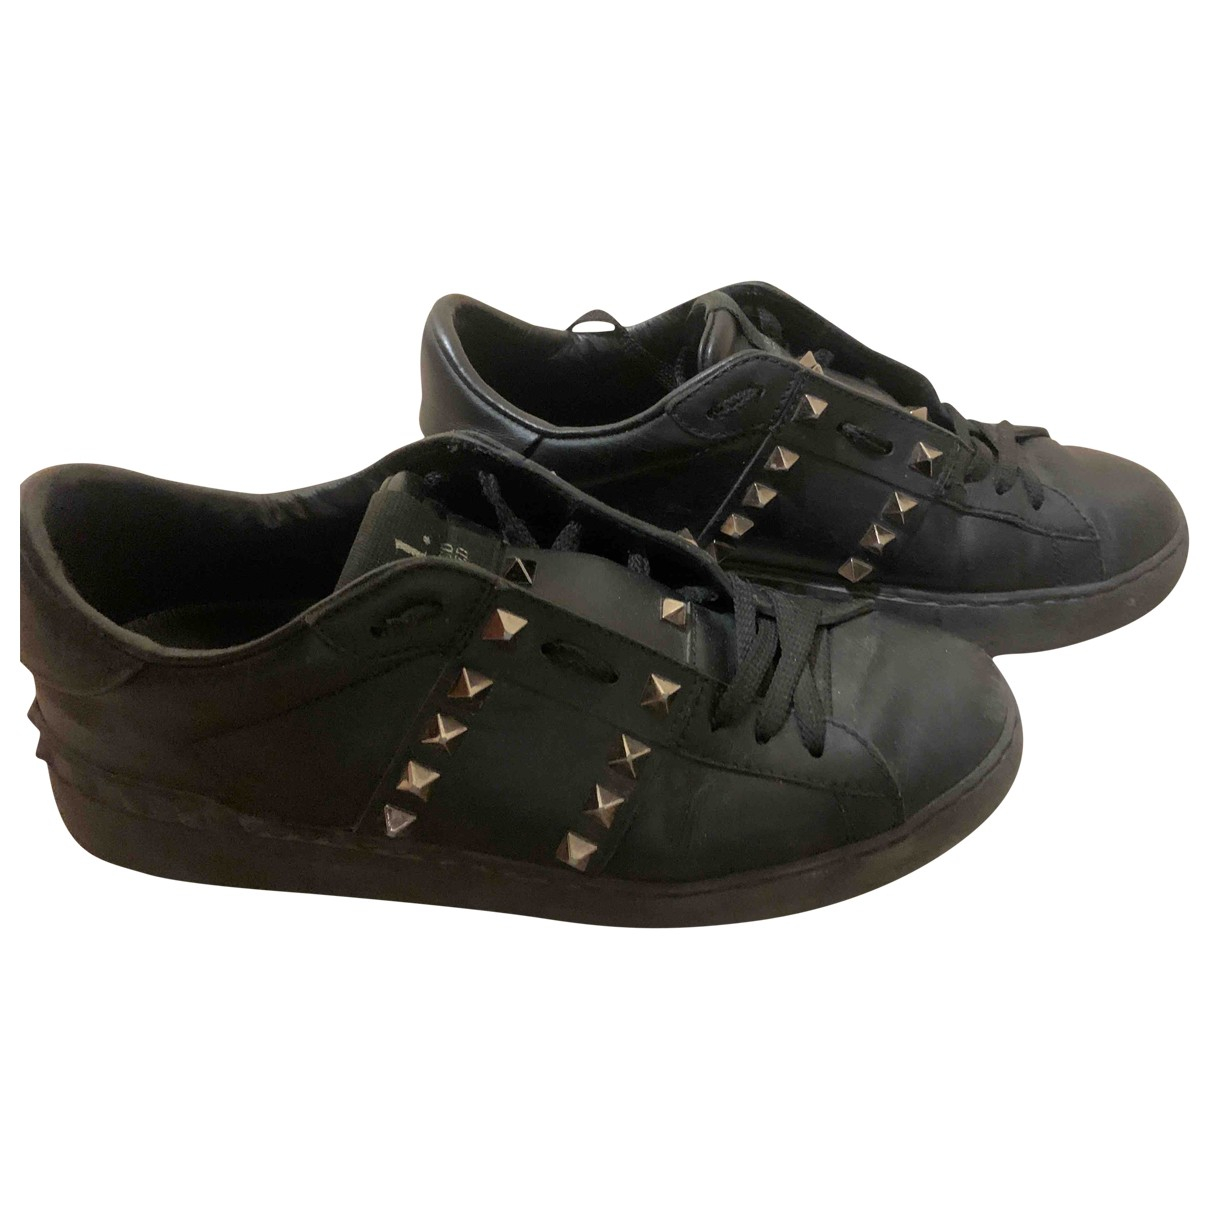 Valentino Garavani Rockstud Black Leather Trainers for Women 37.5 EU